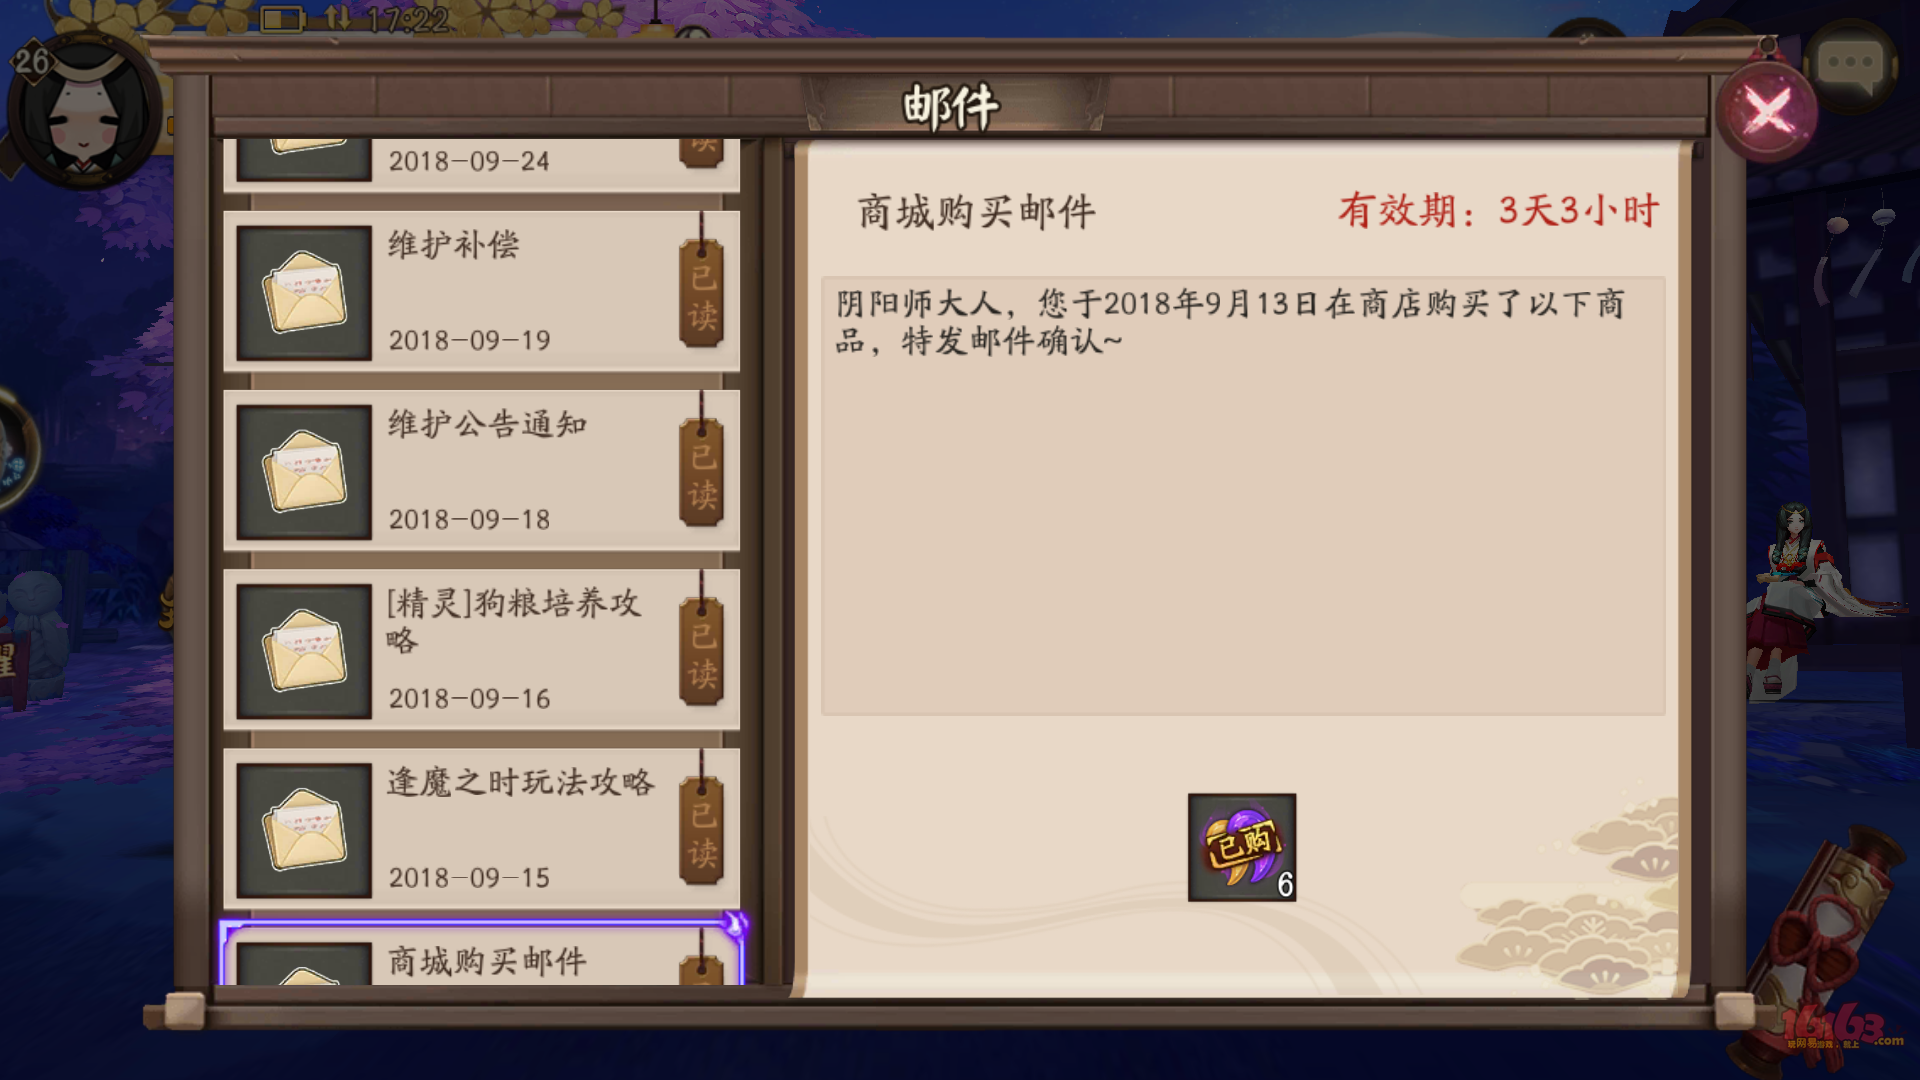 Screenshot_2018-09-25-17-22-26-107_com.netease.onmyoji.mi.png